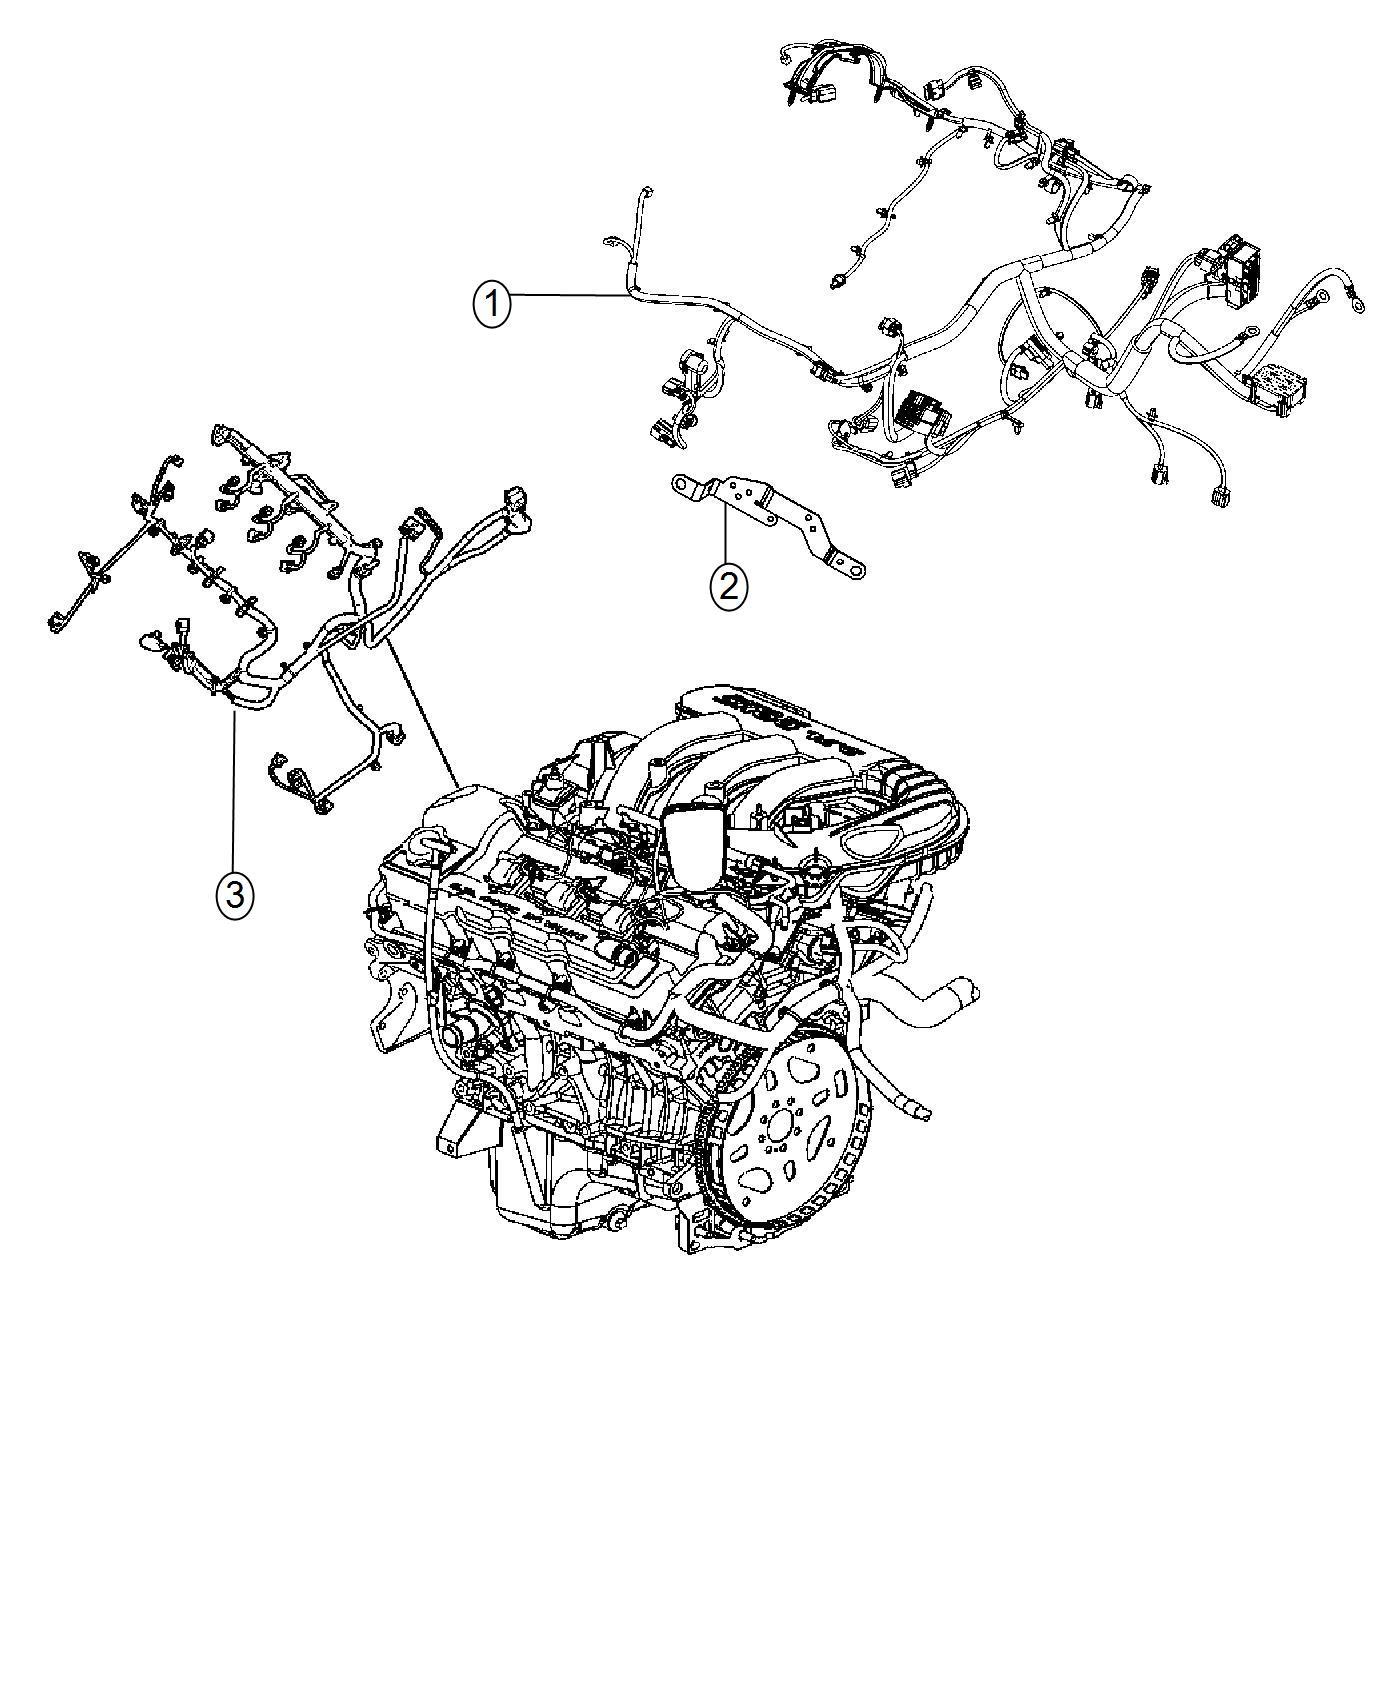 2014 Dodge Journey Wiring. Engine. Includes transmission